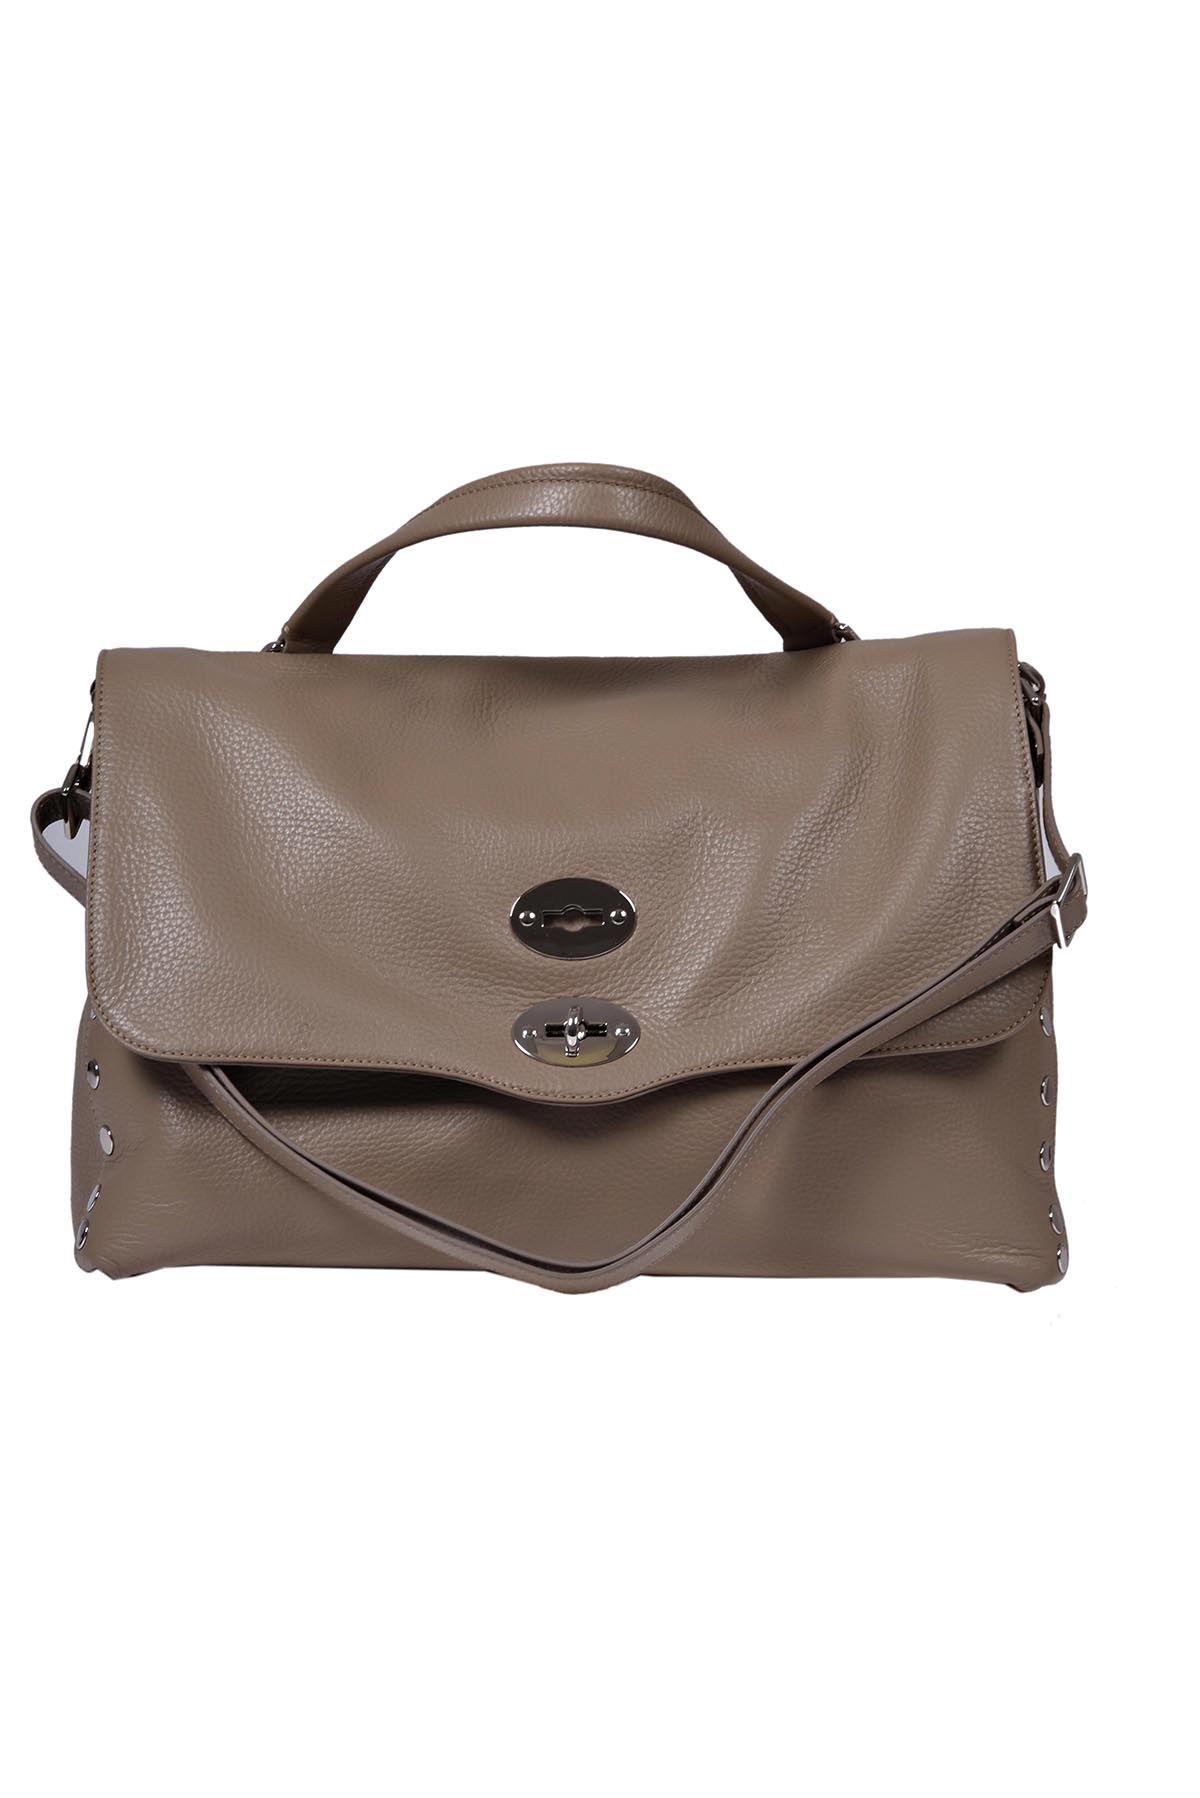 Zanellato Postina M Daily bag